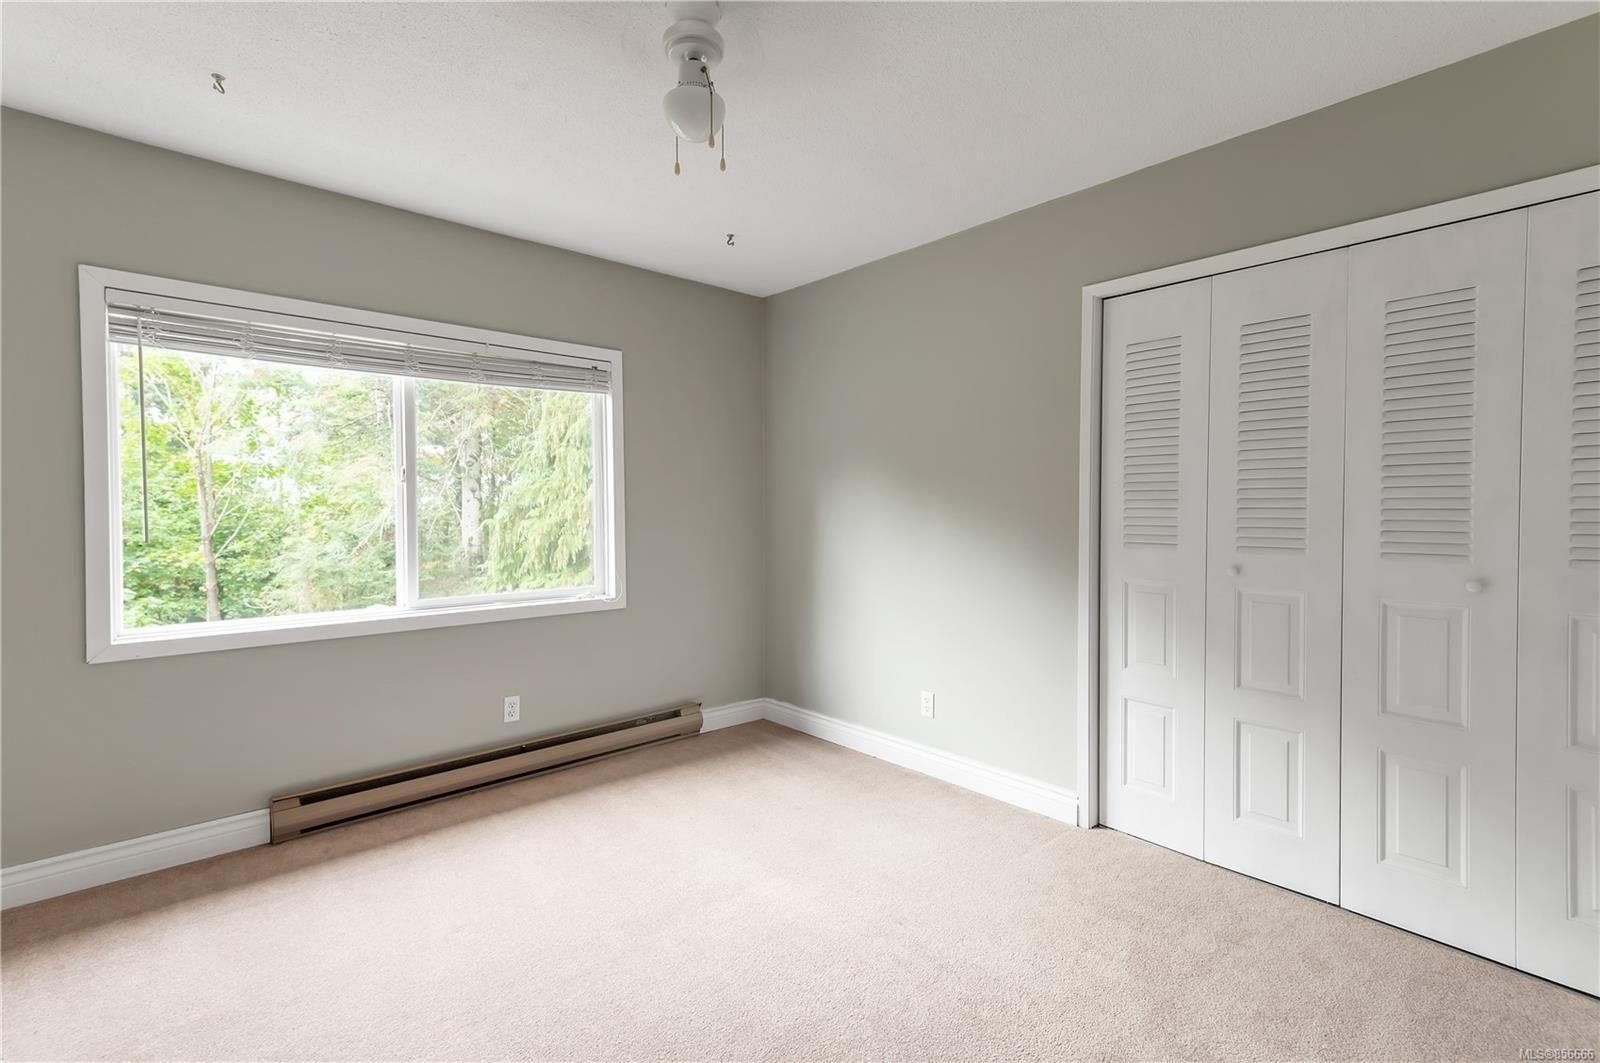 Photo 32: Photos: 2468 Oakes Rd in : CV Merville Black Creek House for sale (Comox Valley)  : MLS®# 856666